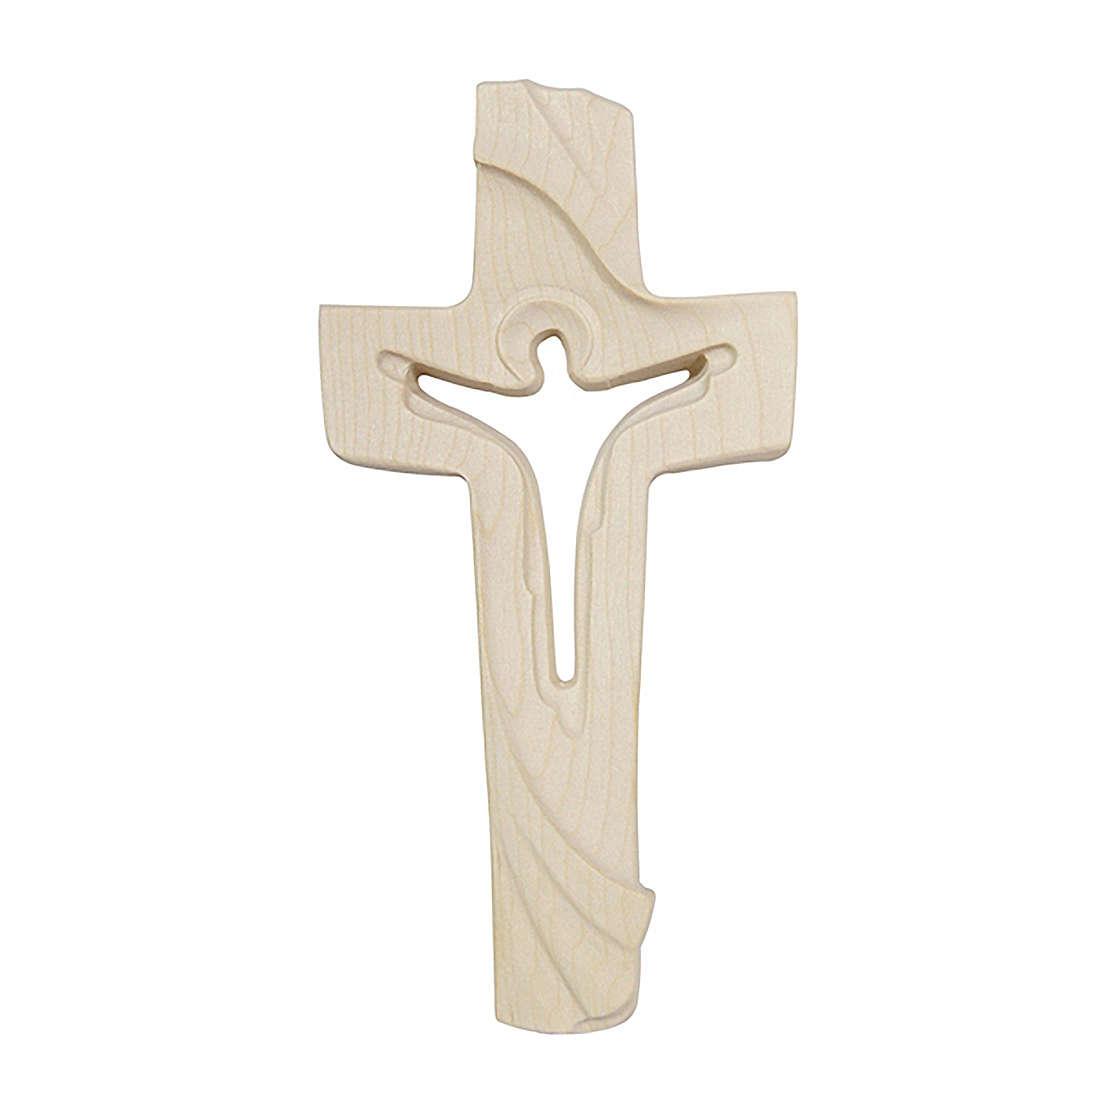 Croce della Pace Ambiente Design legno Valgardena naturale 4